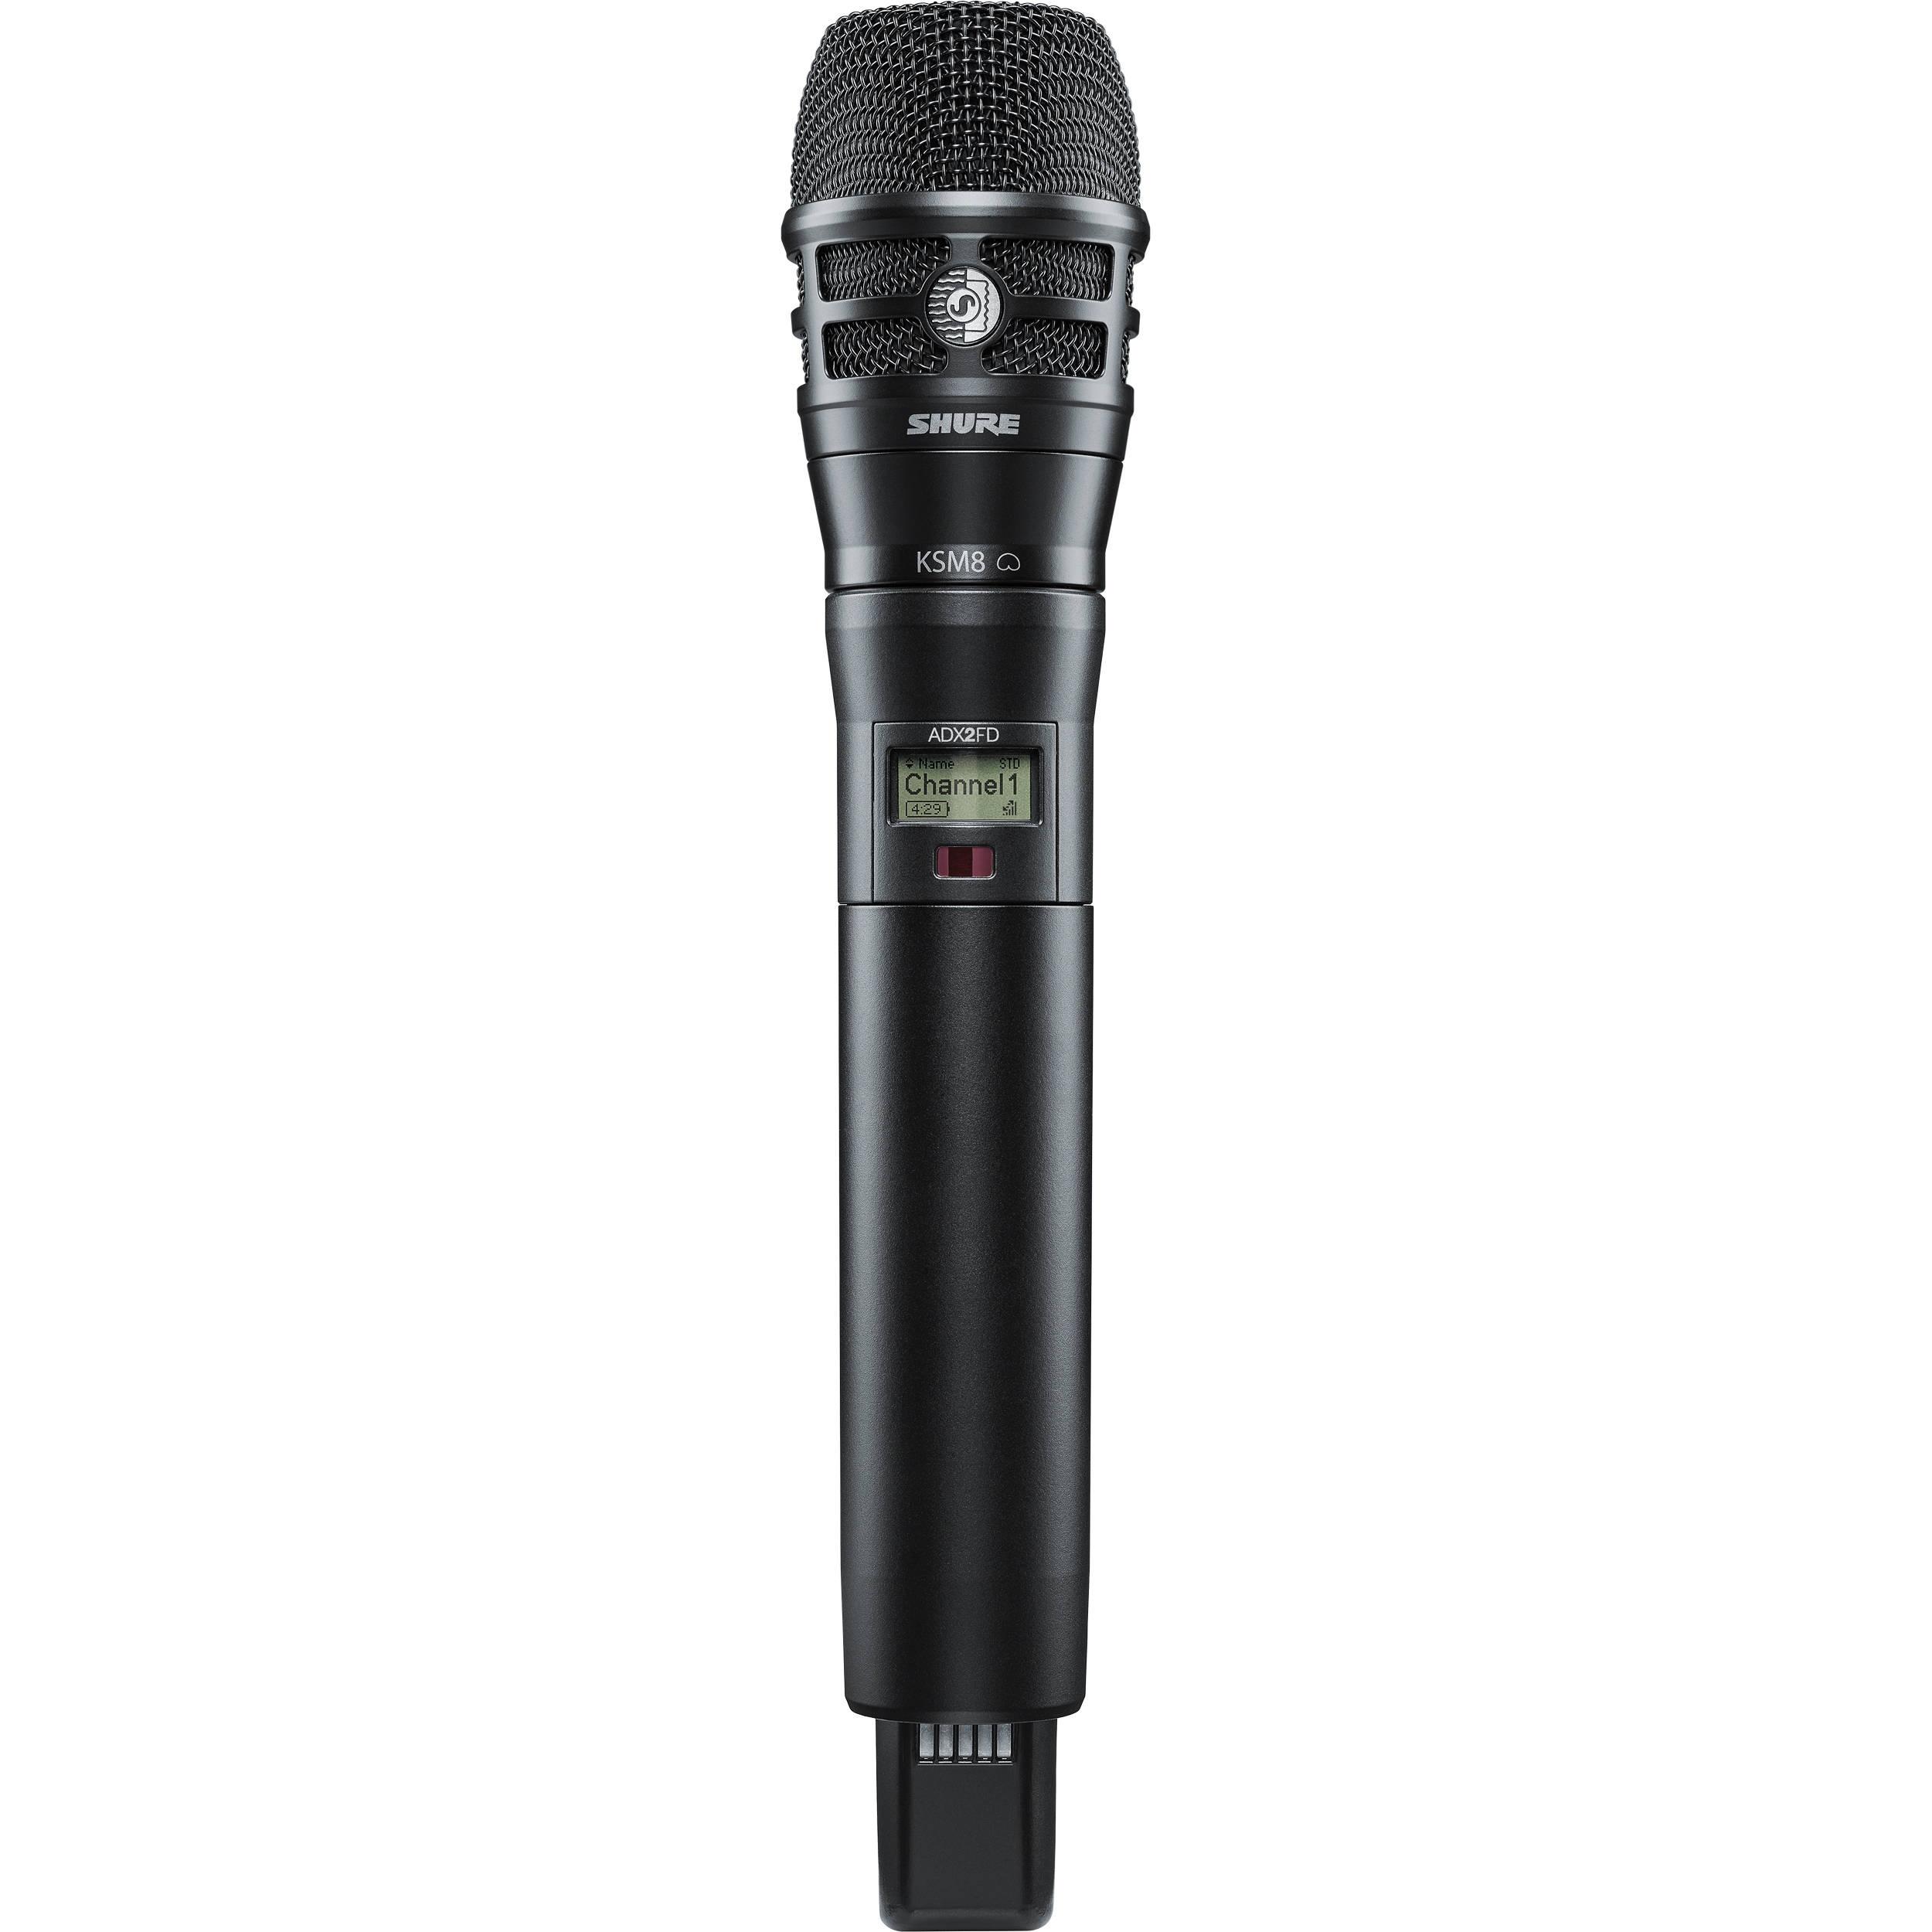 Shure ADX2FD/K8B Digital Handheld Wireless Microphone Transmitter with KSM8 Capsule